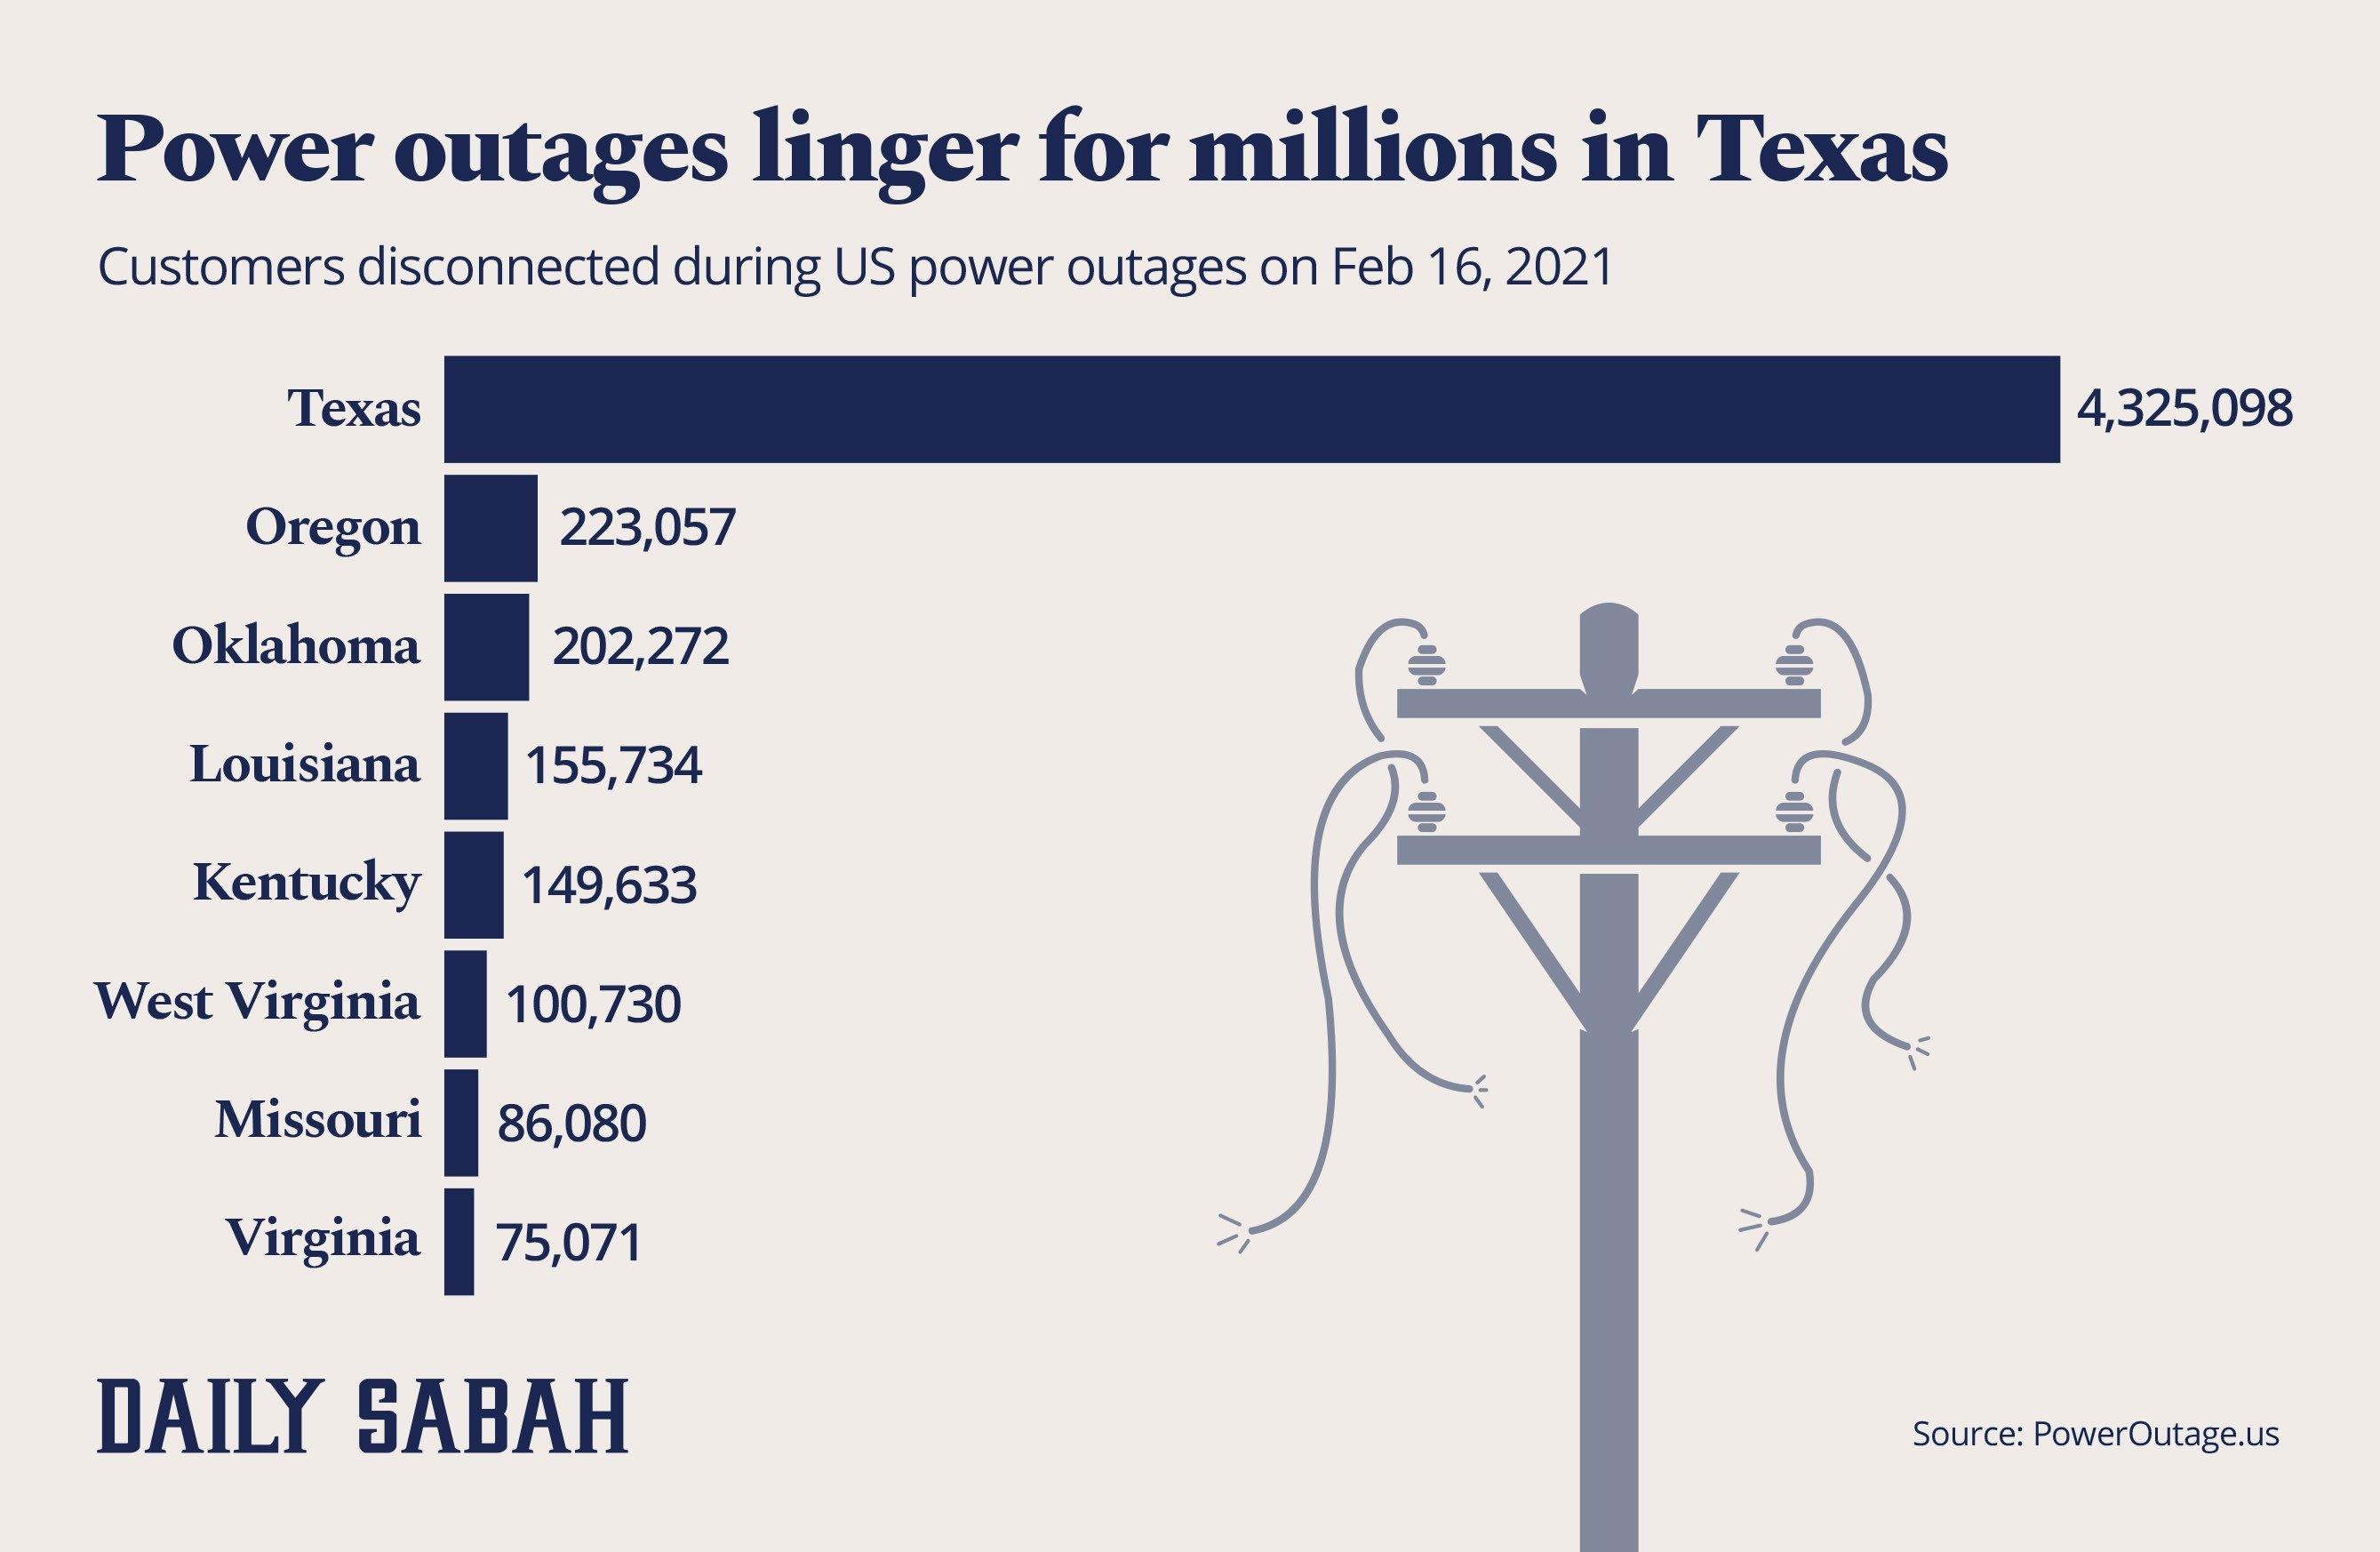 Power outages linger for millions in Texas. (By Büşra Öztürk / Daily Sabah)